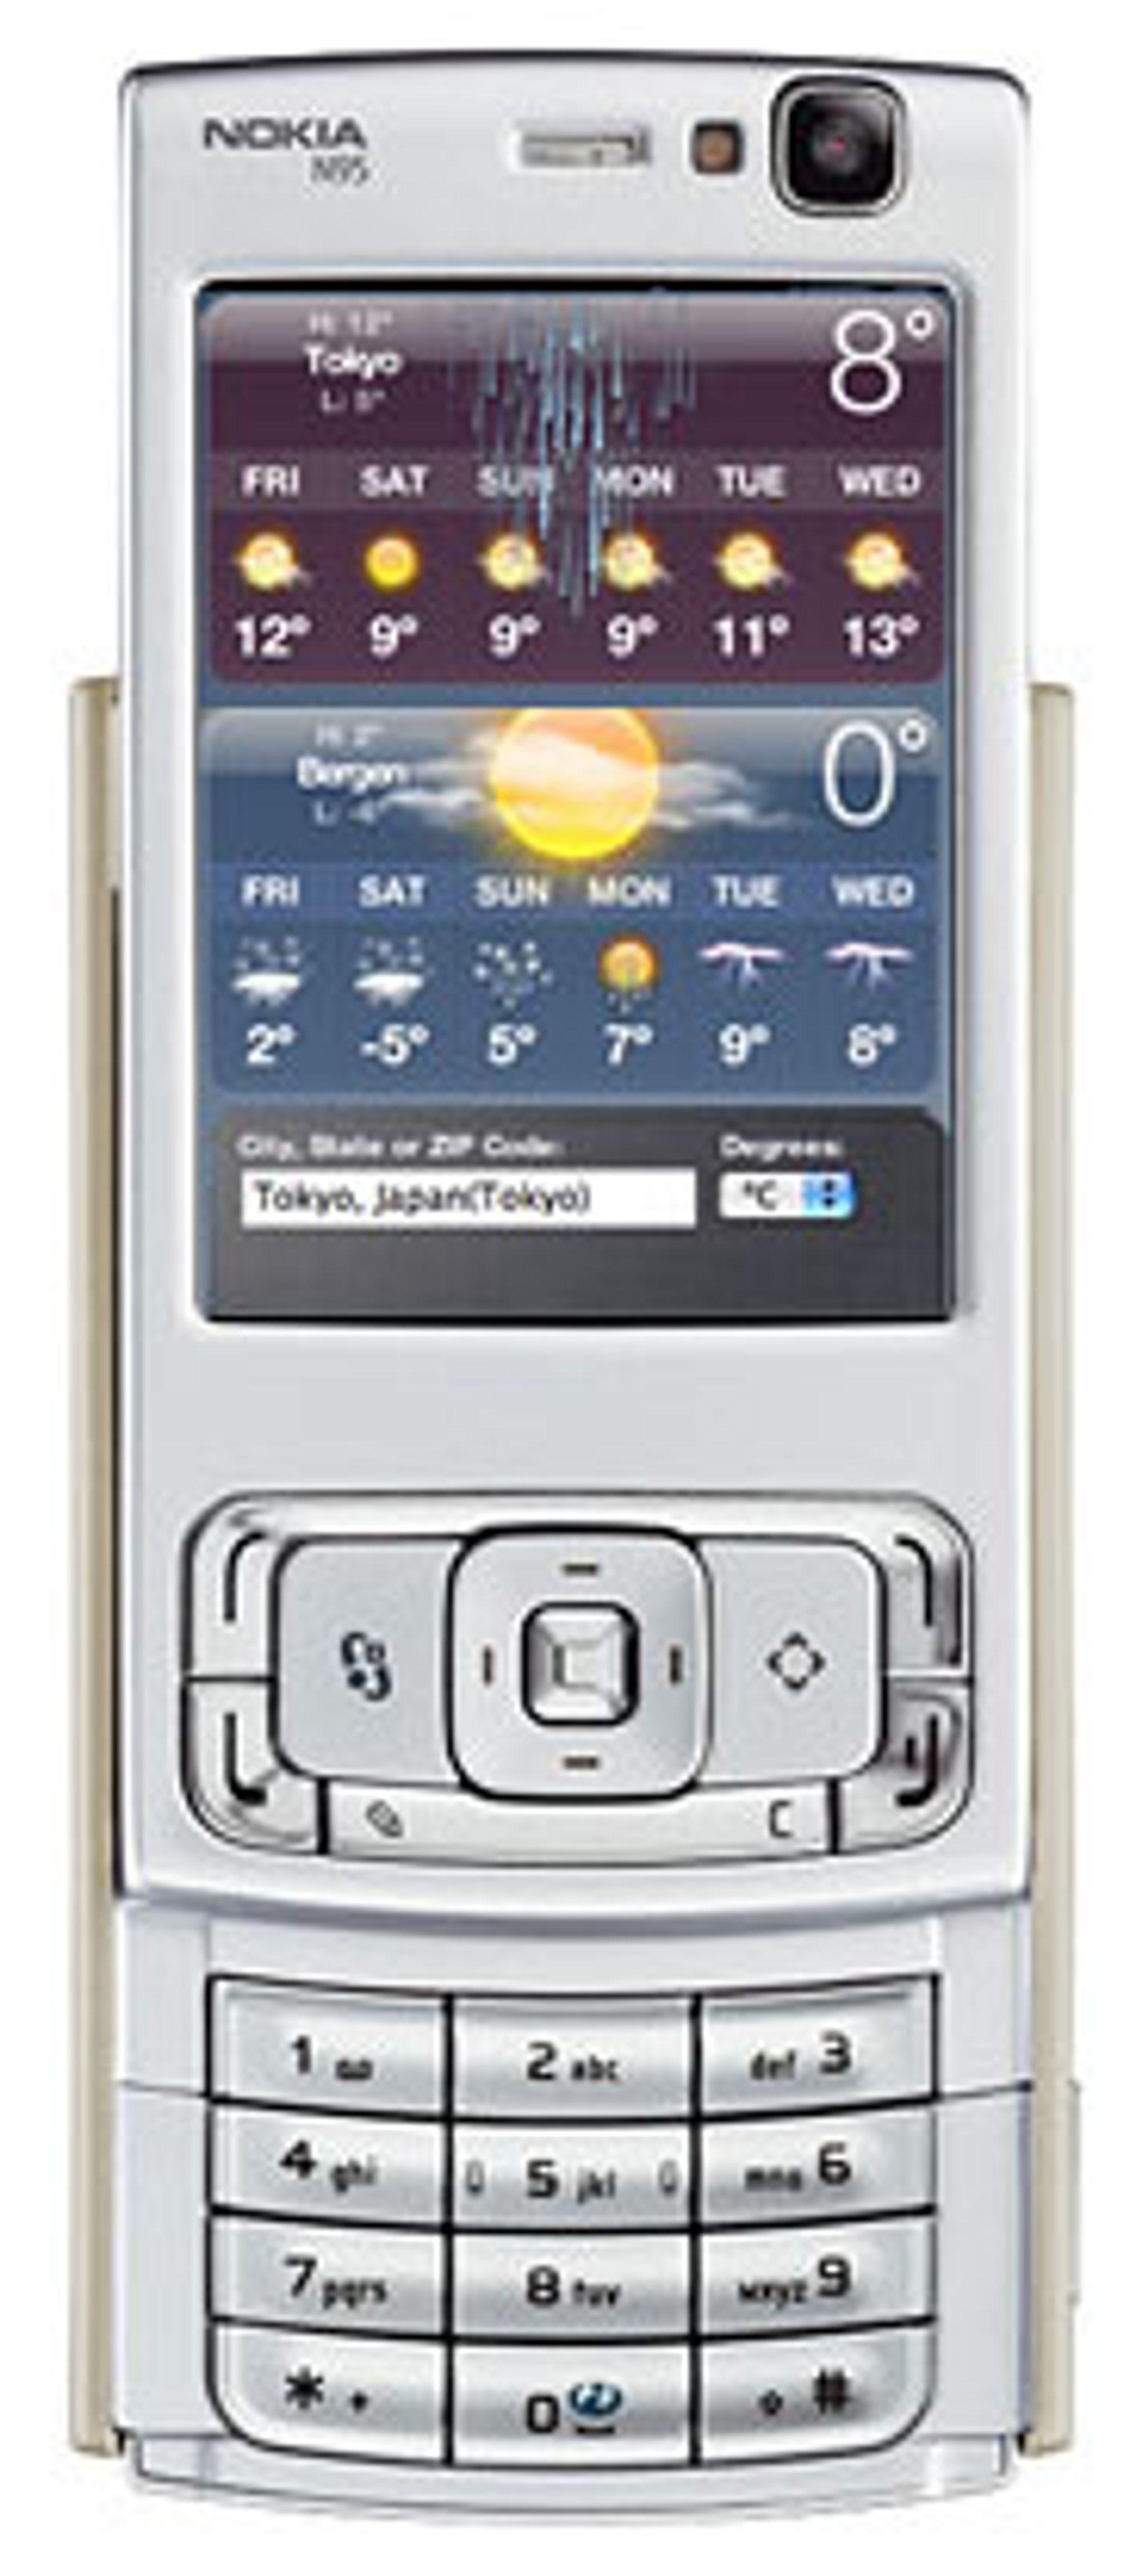 Opera Mobile 9 kommer med Widgets (Bilde: Opera)